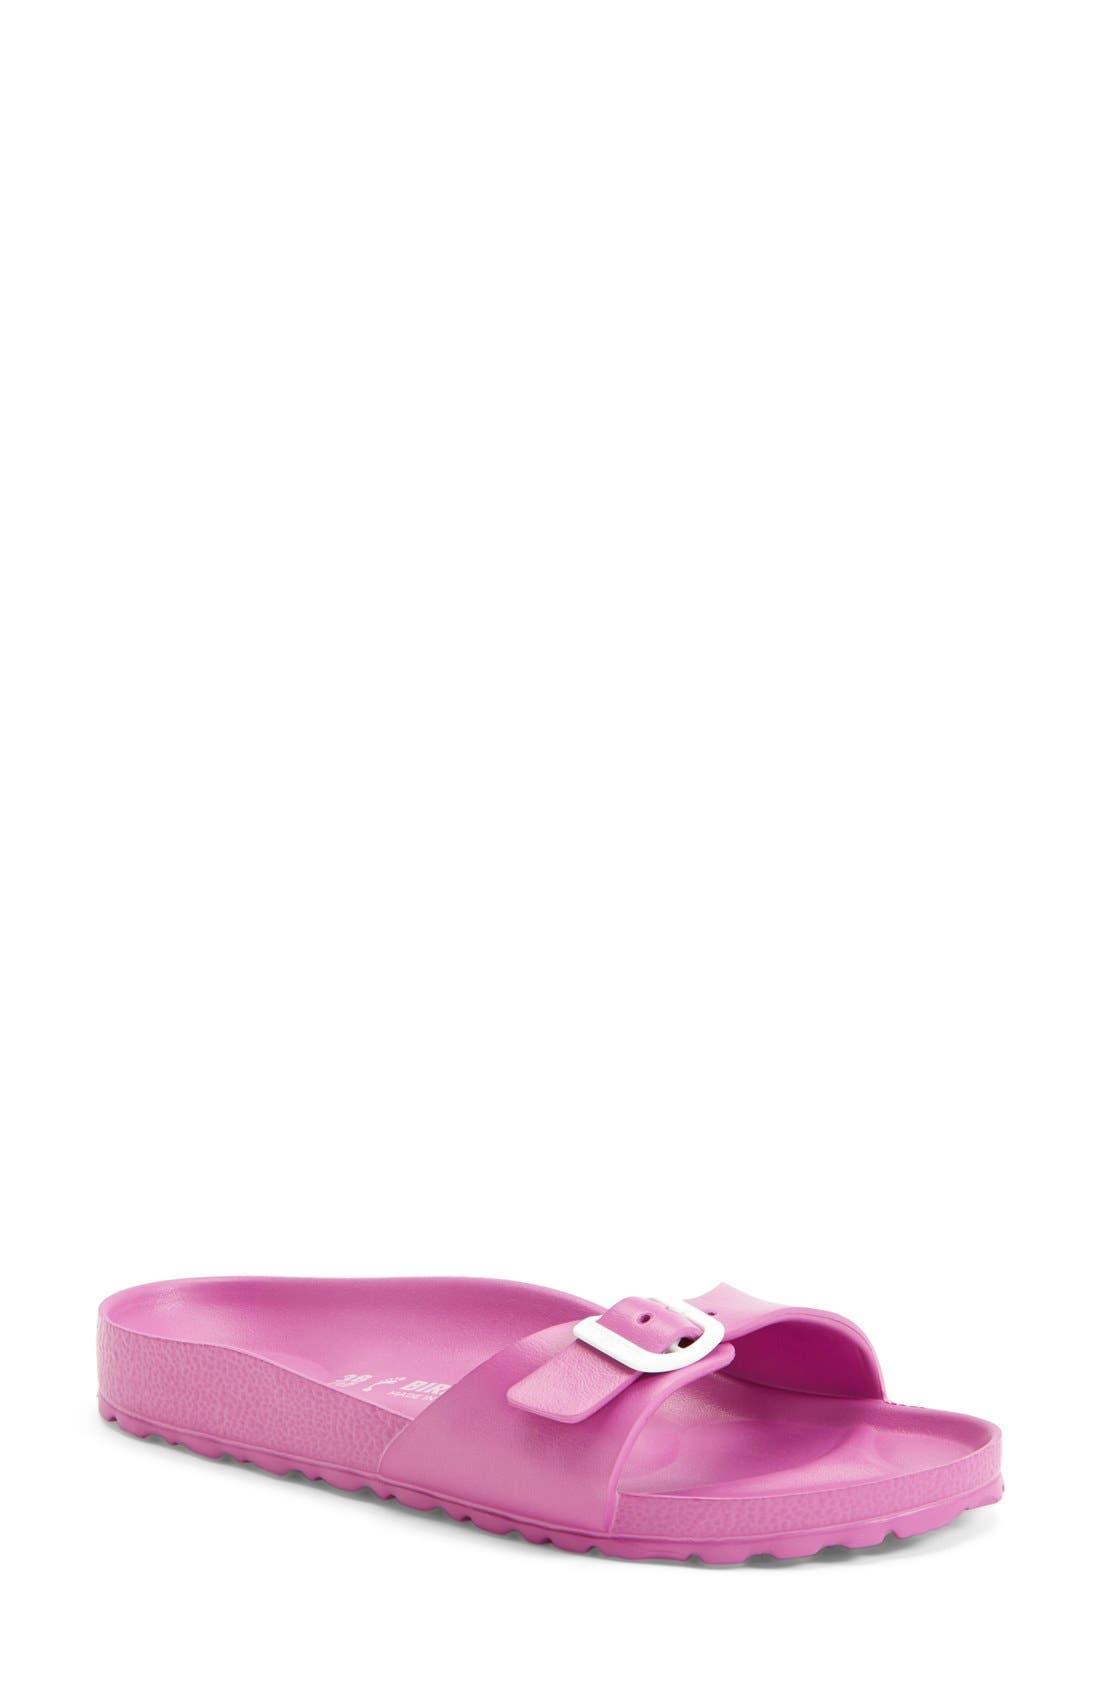 'Essentials - Madrid' Slide Sandal,                             Main thumbnail 8, color,